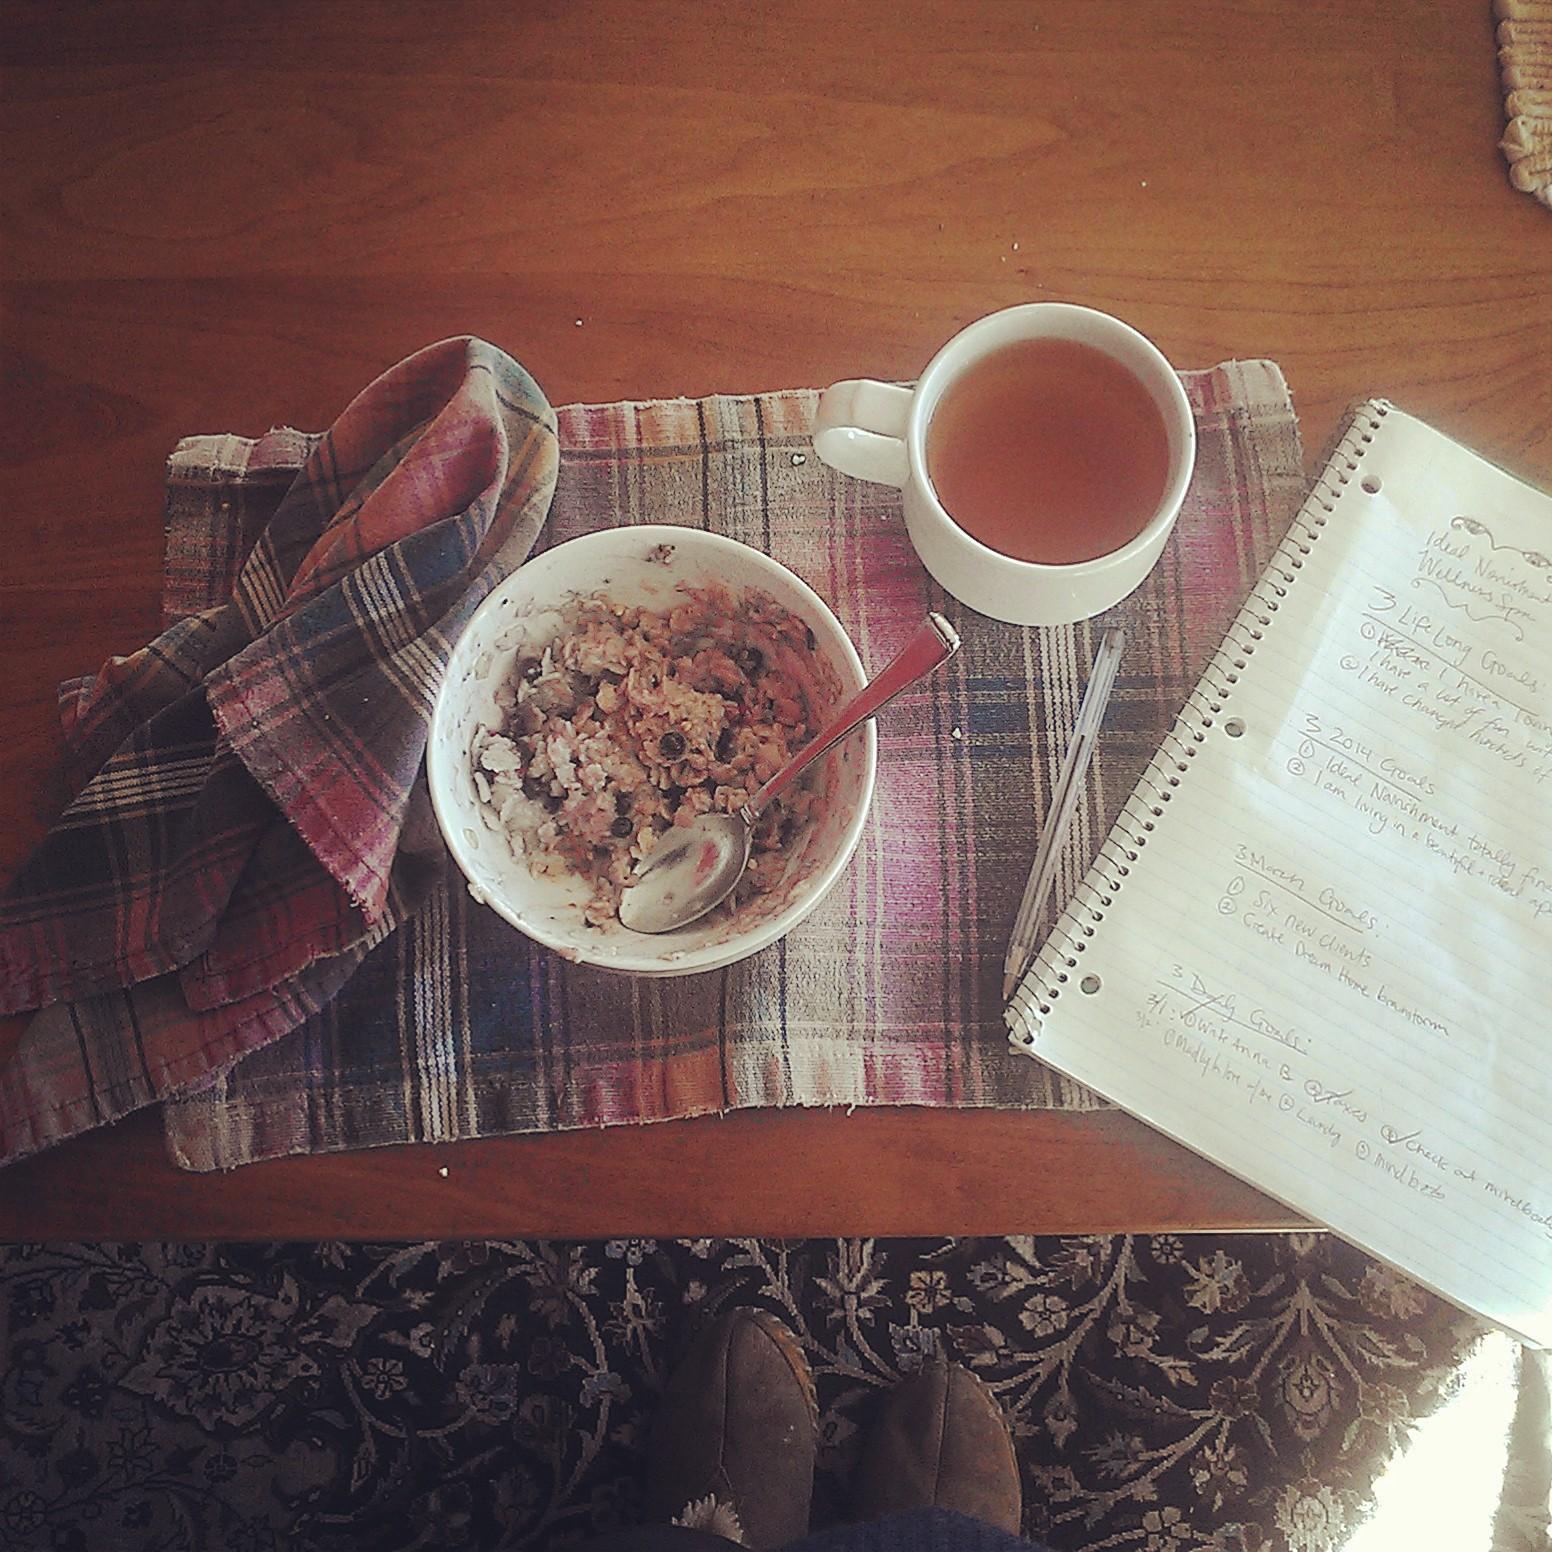 Women's Creative Health Coach | Lily Calfee + Ideal Nourishment | Healthy Breakfast Ideas